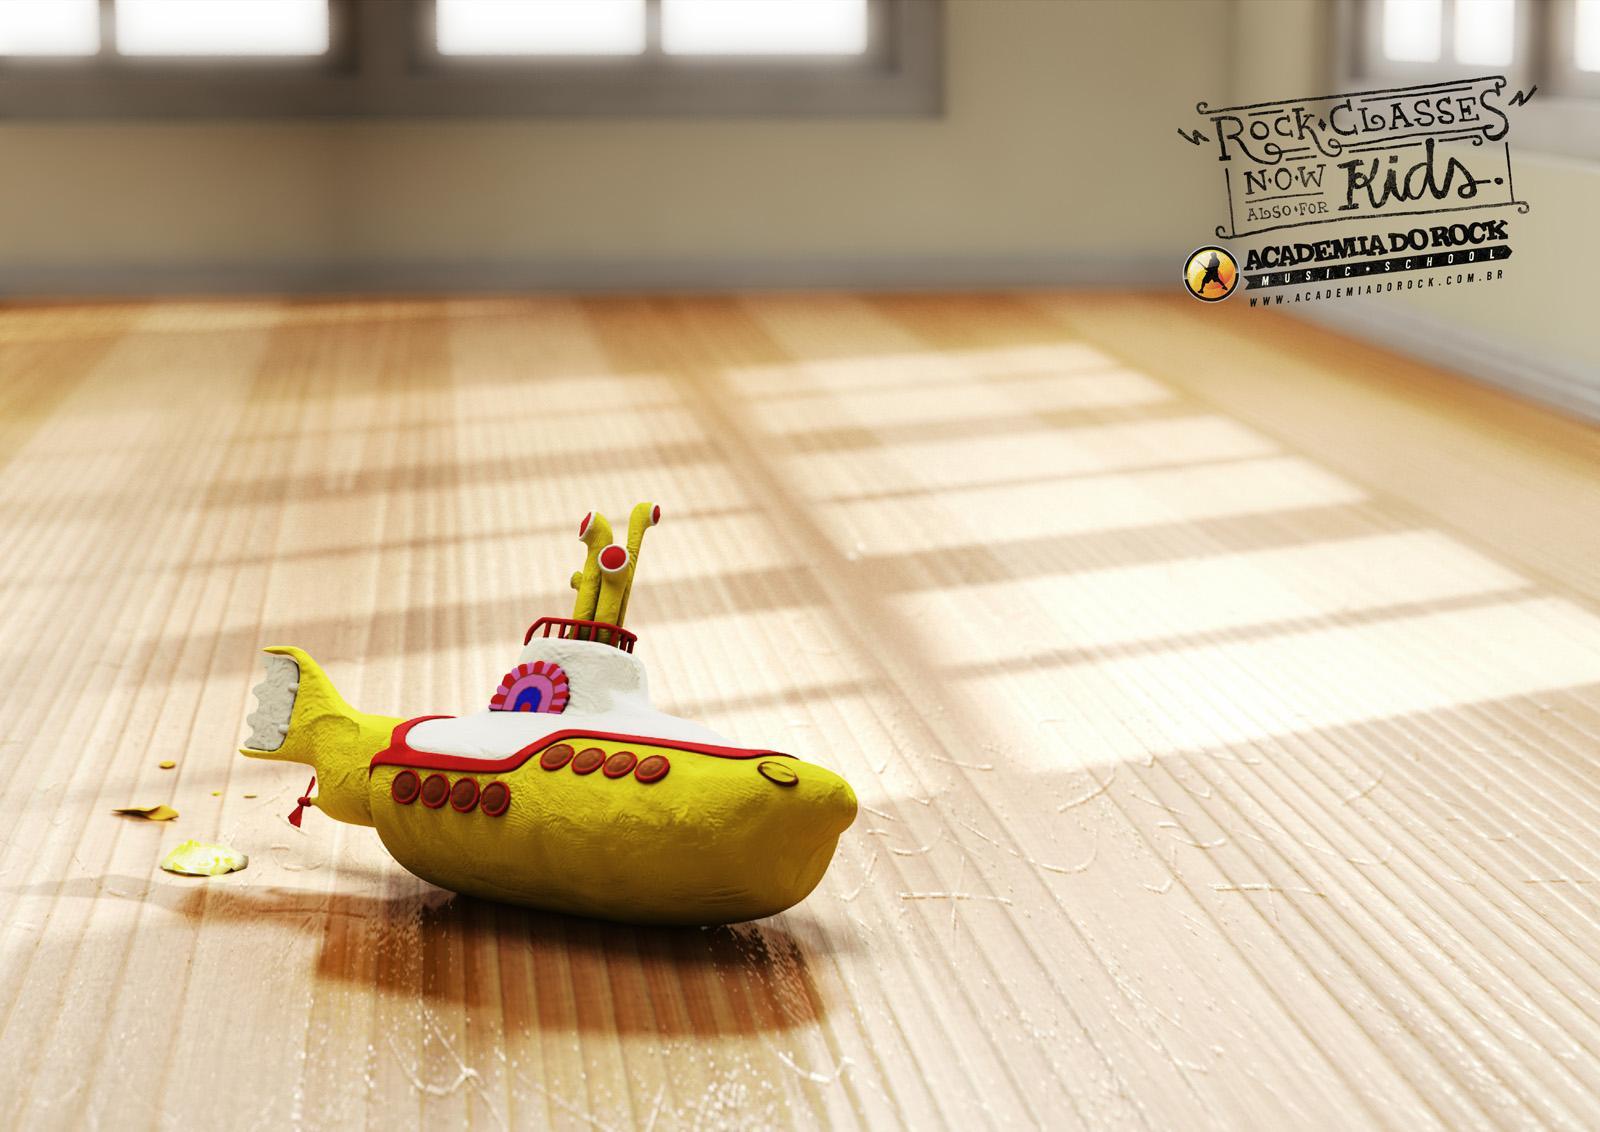 Academia do Rock Print Ad -  Submarine